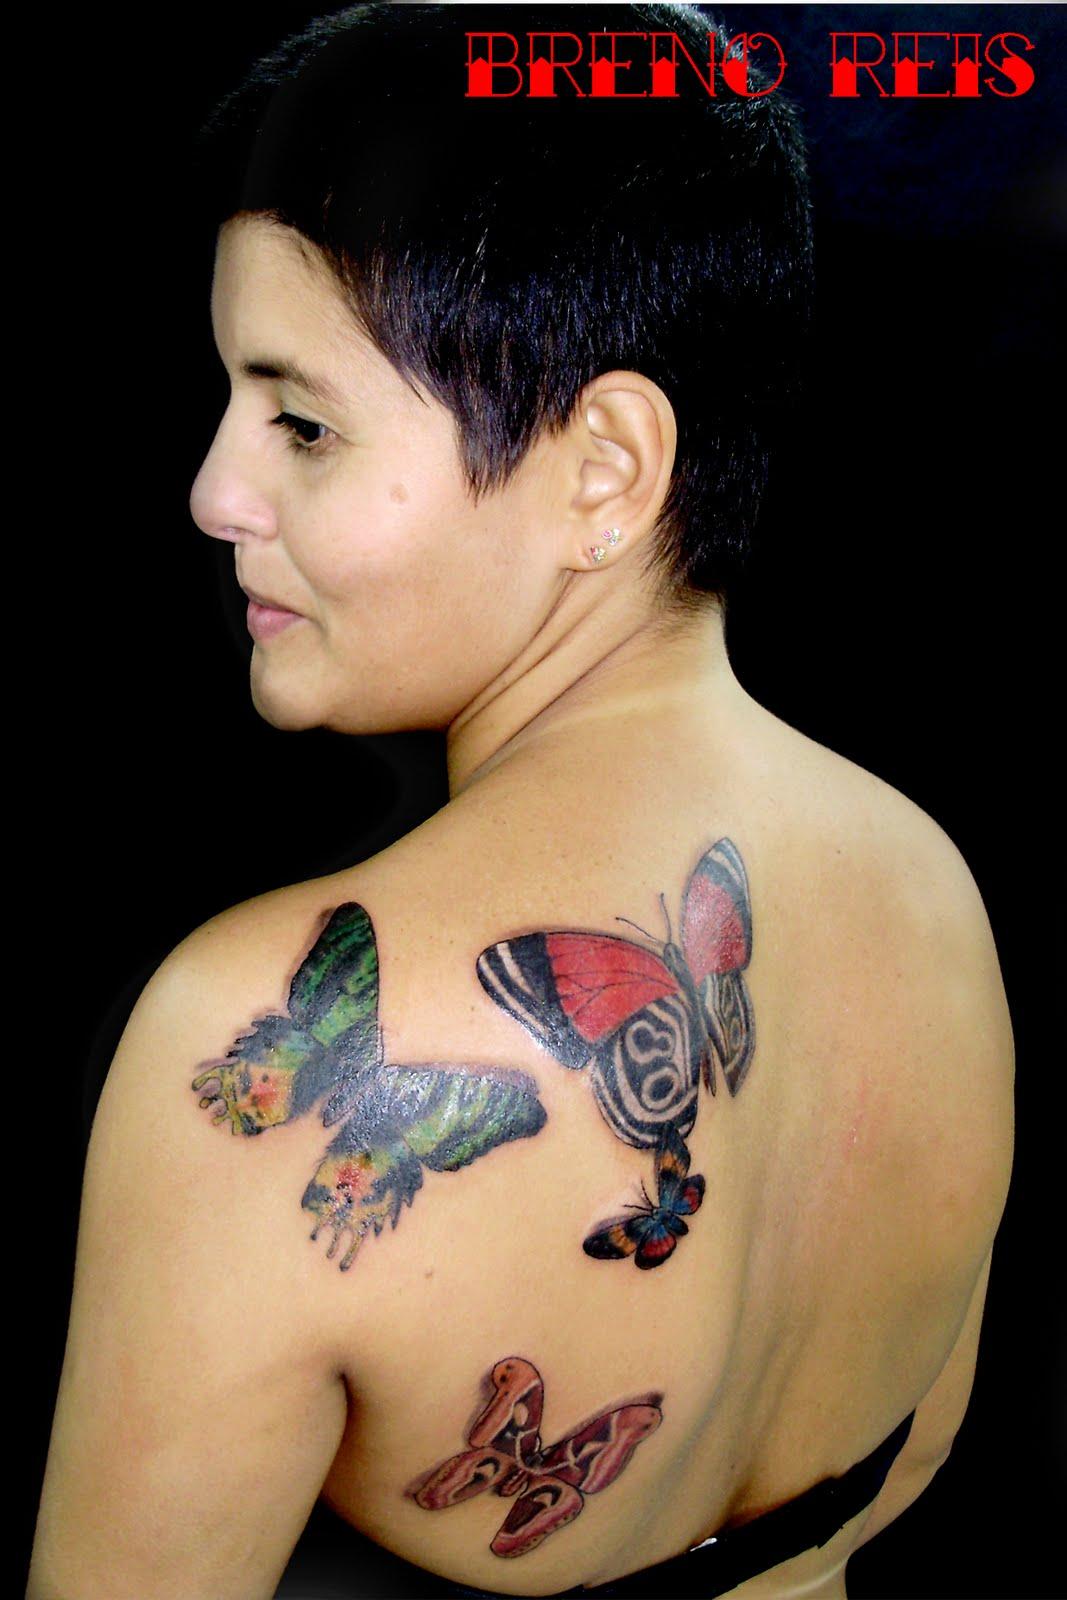 http://1.bp.blogspot.com/_lT9snefCZFw/TJp31LfMgJI/AAAAAAAAAUI/s7ooED0828M/s1600/borboletas+costas.jpg